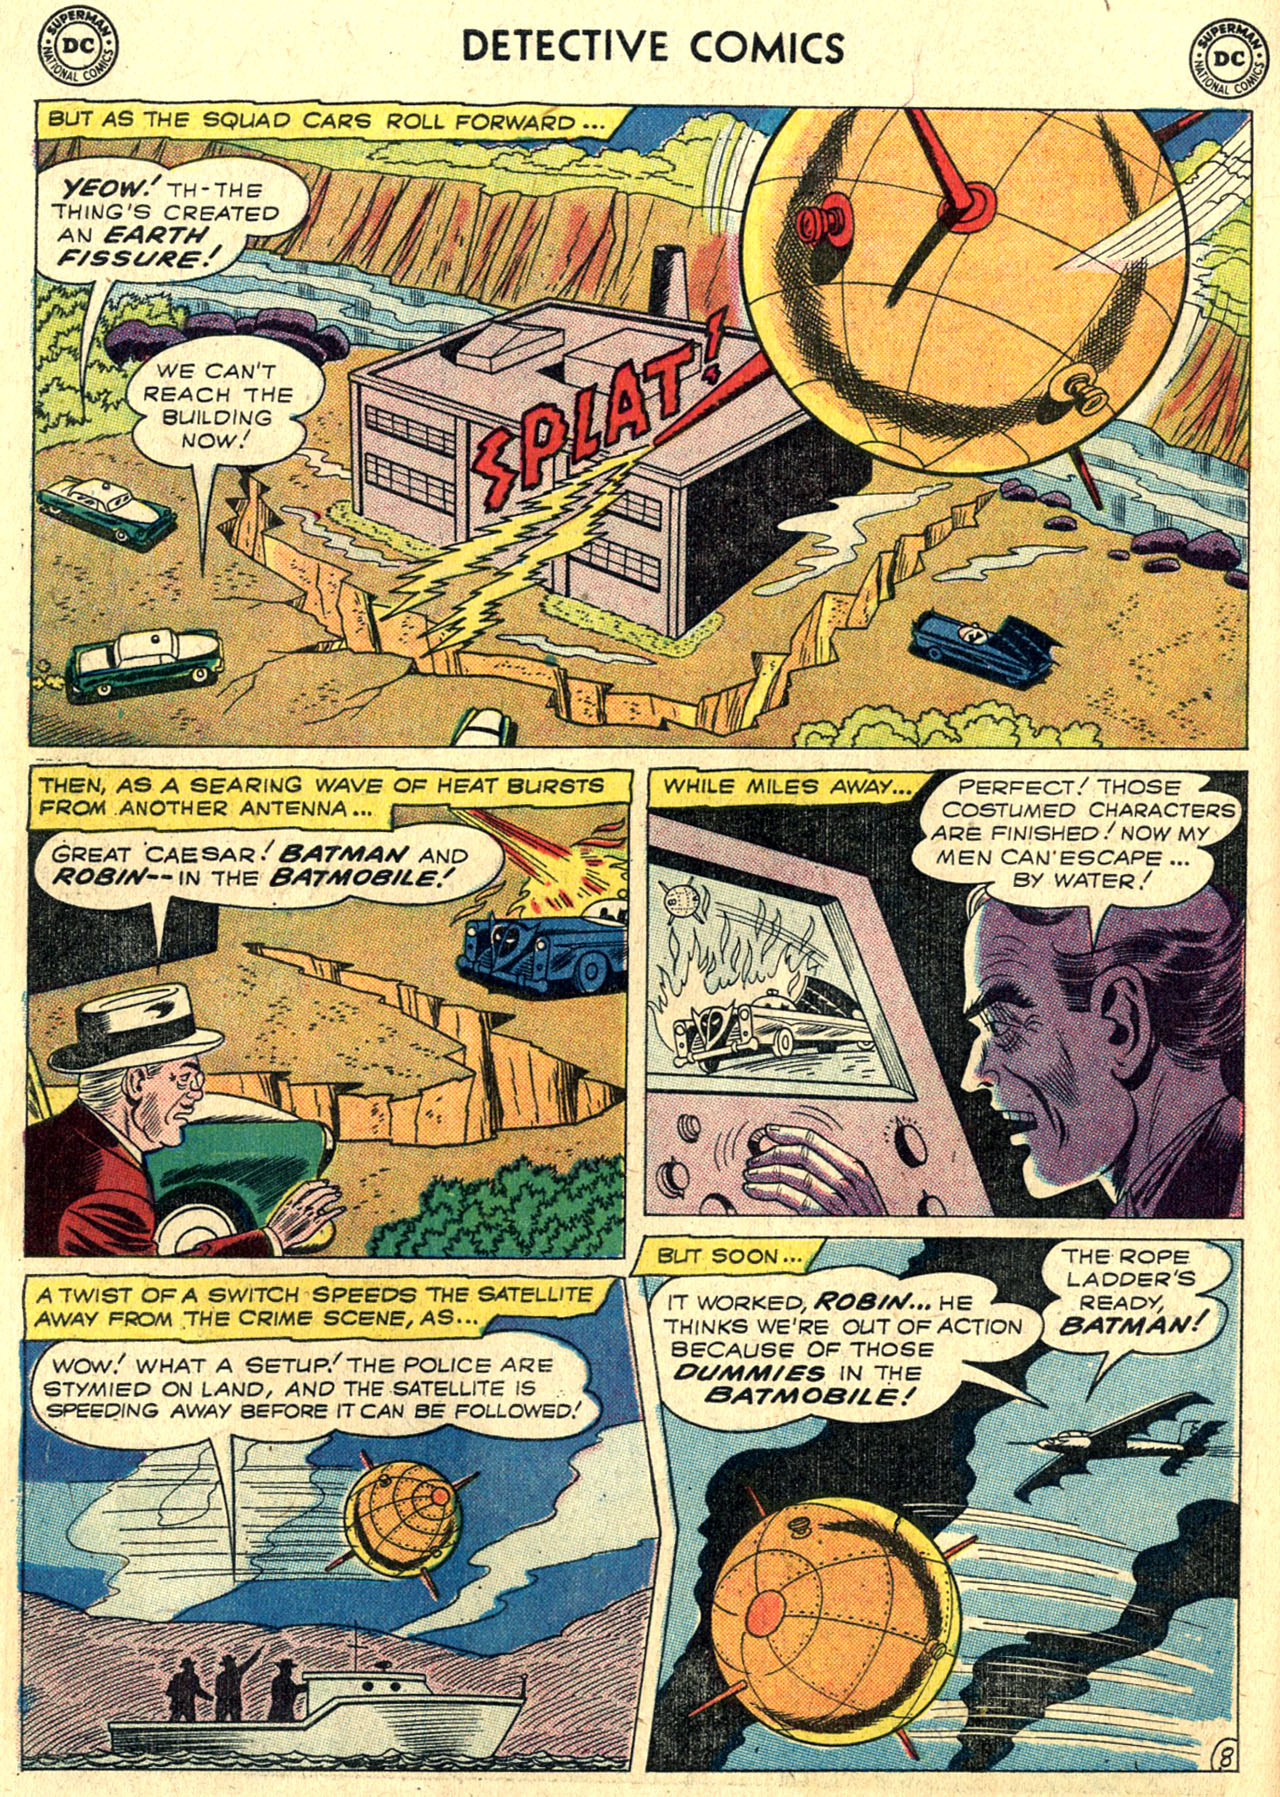 Detective Comics (1937) 266 Page 9